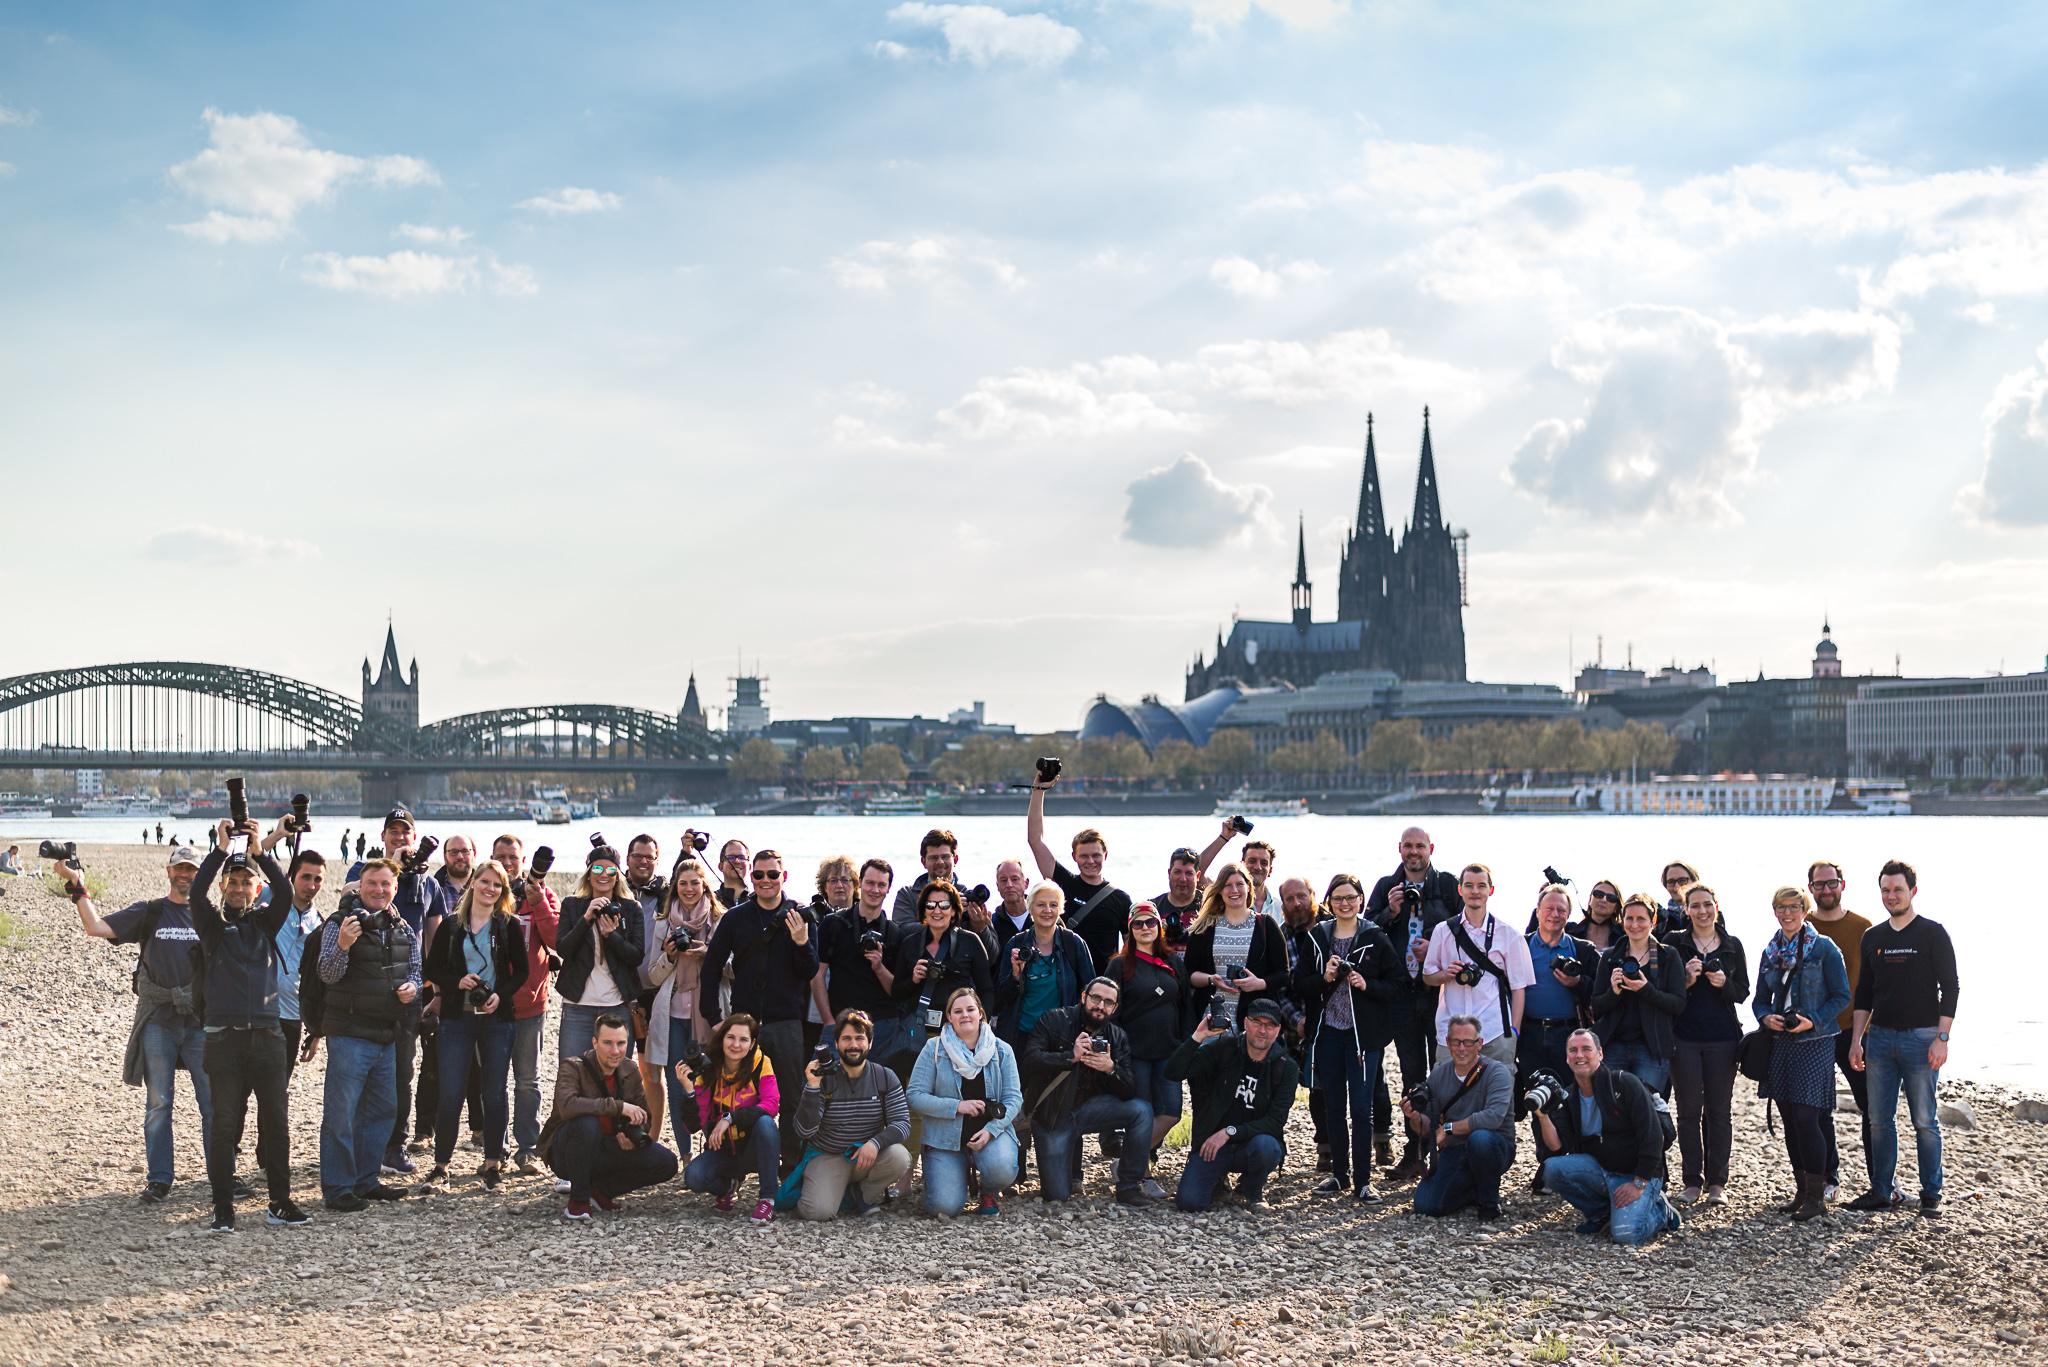 Gruppenbild 2 Photowalk